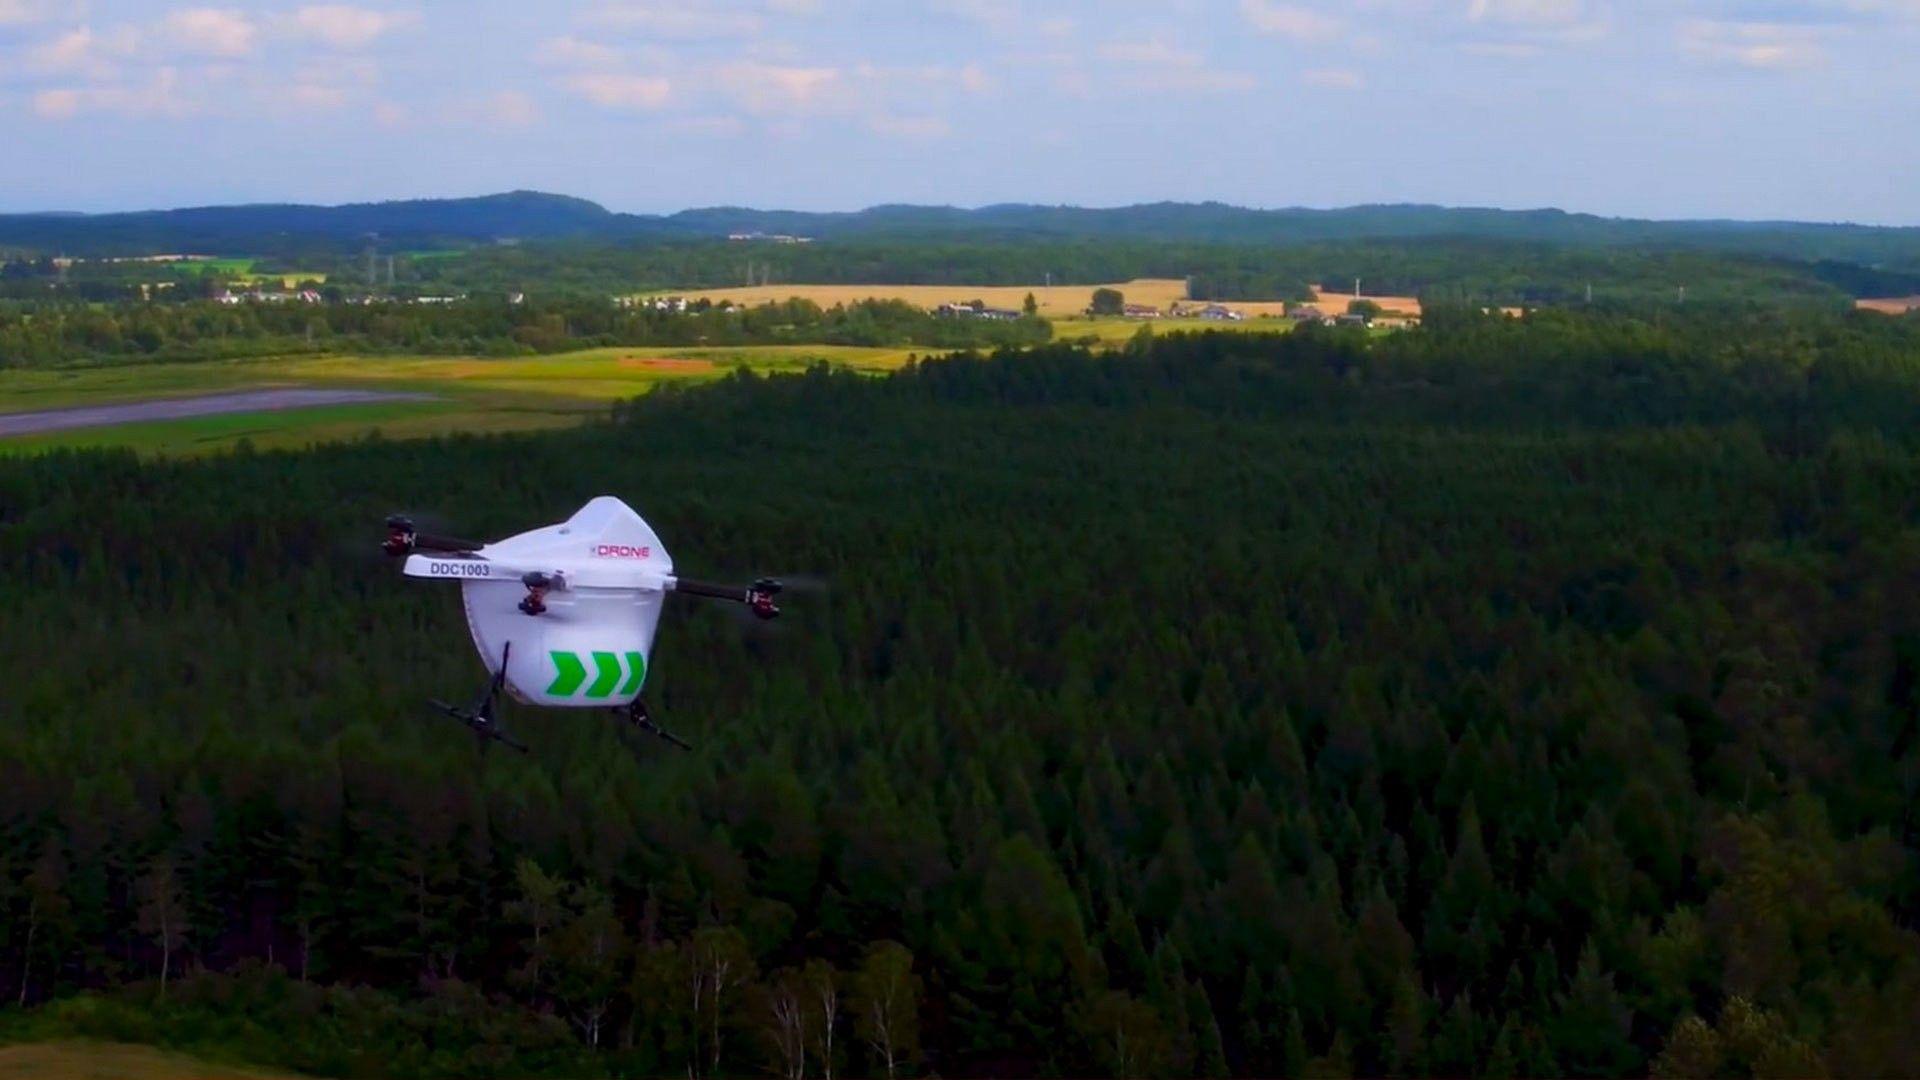 Acheter formation pilotage drone drones for sale